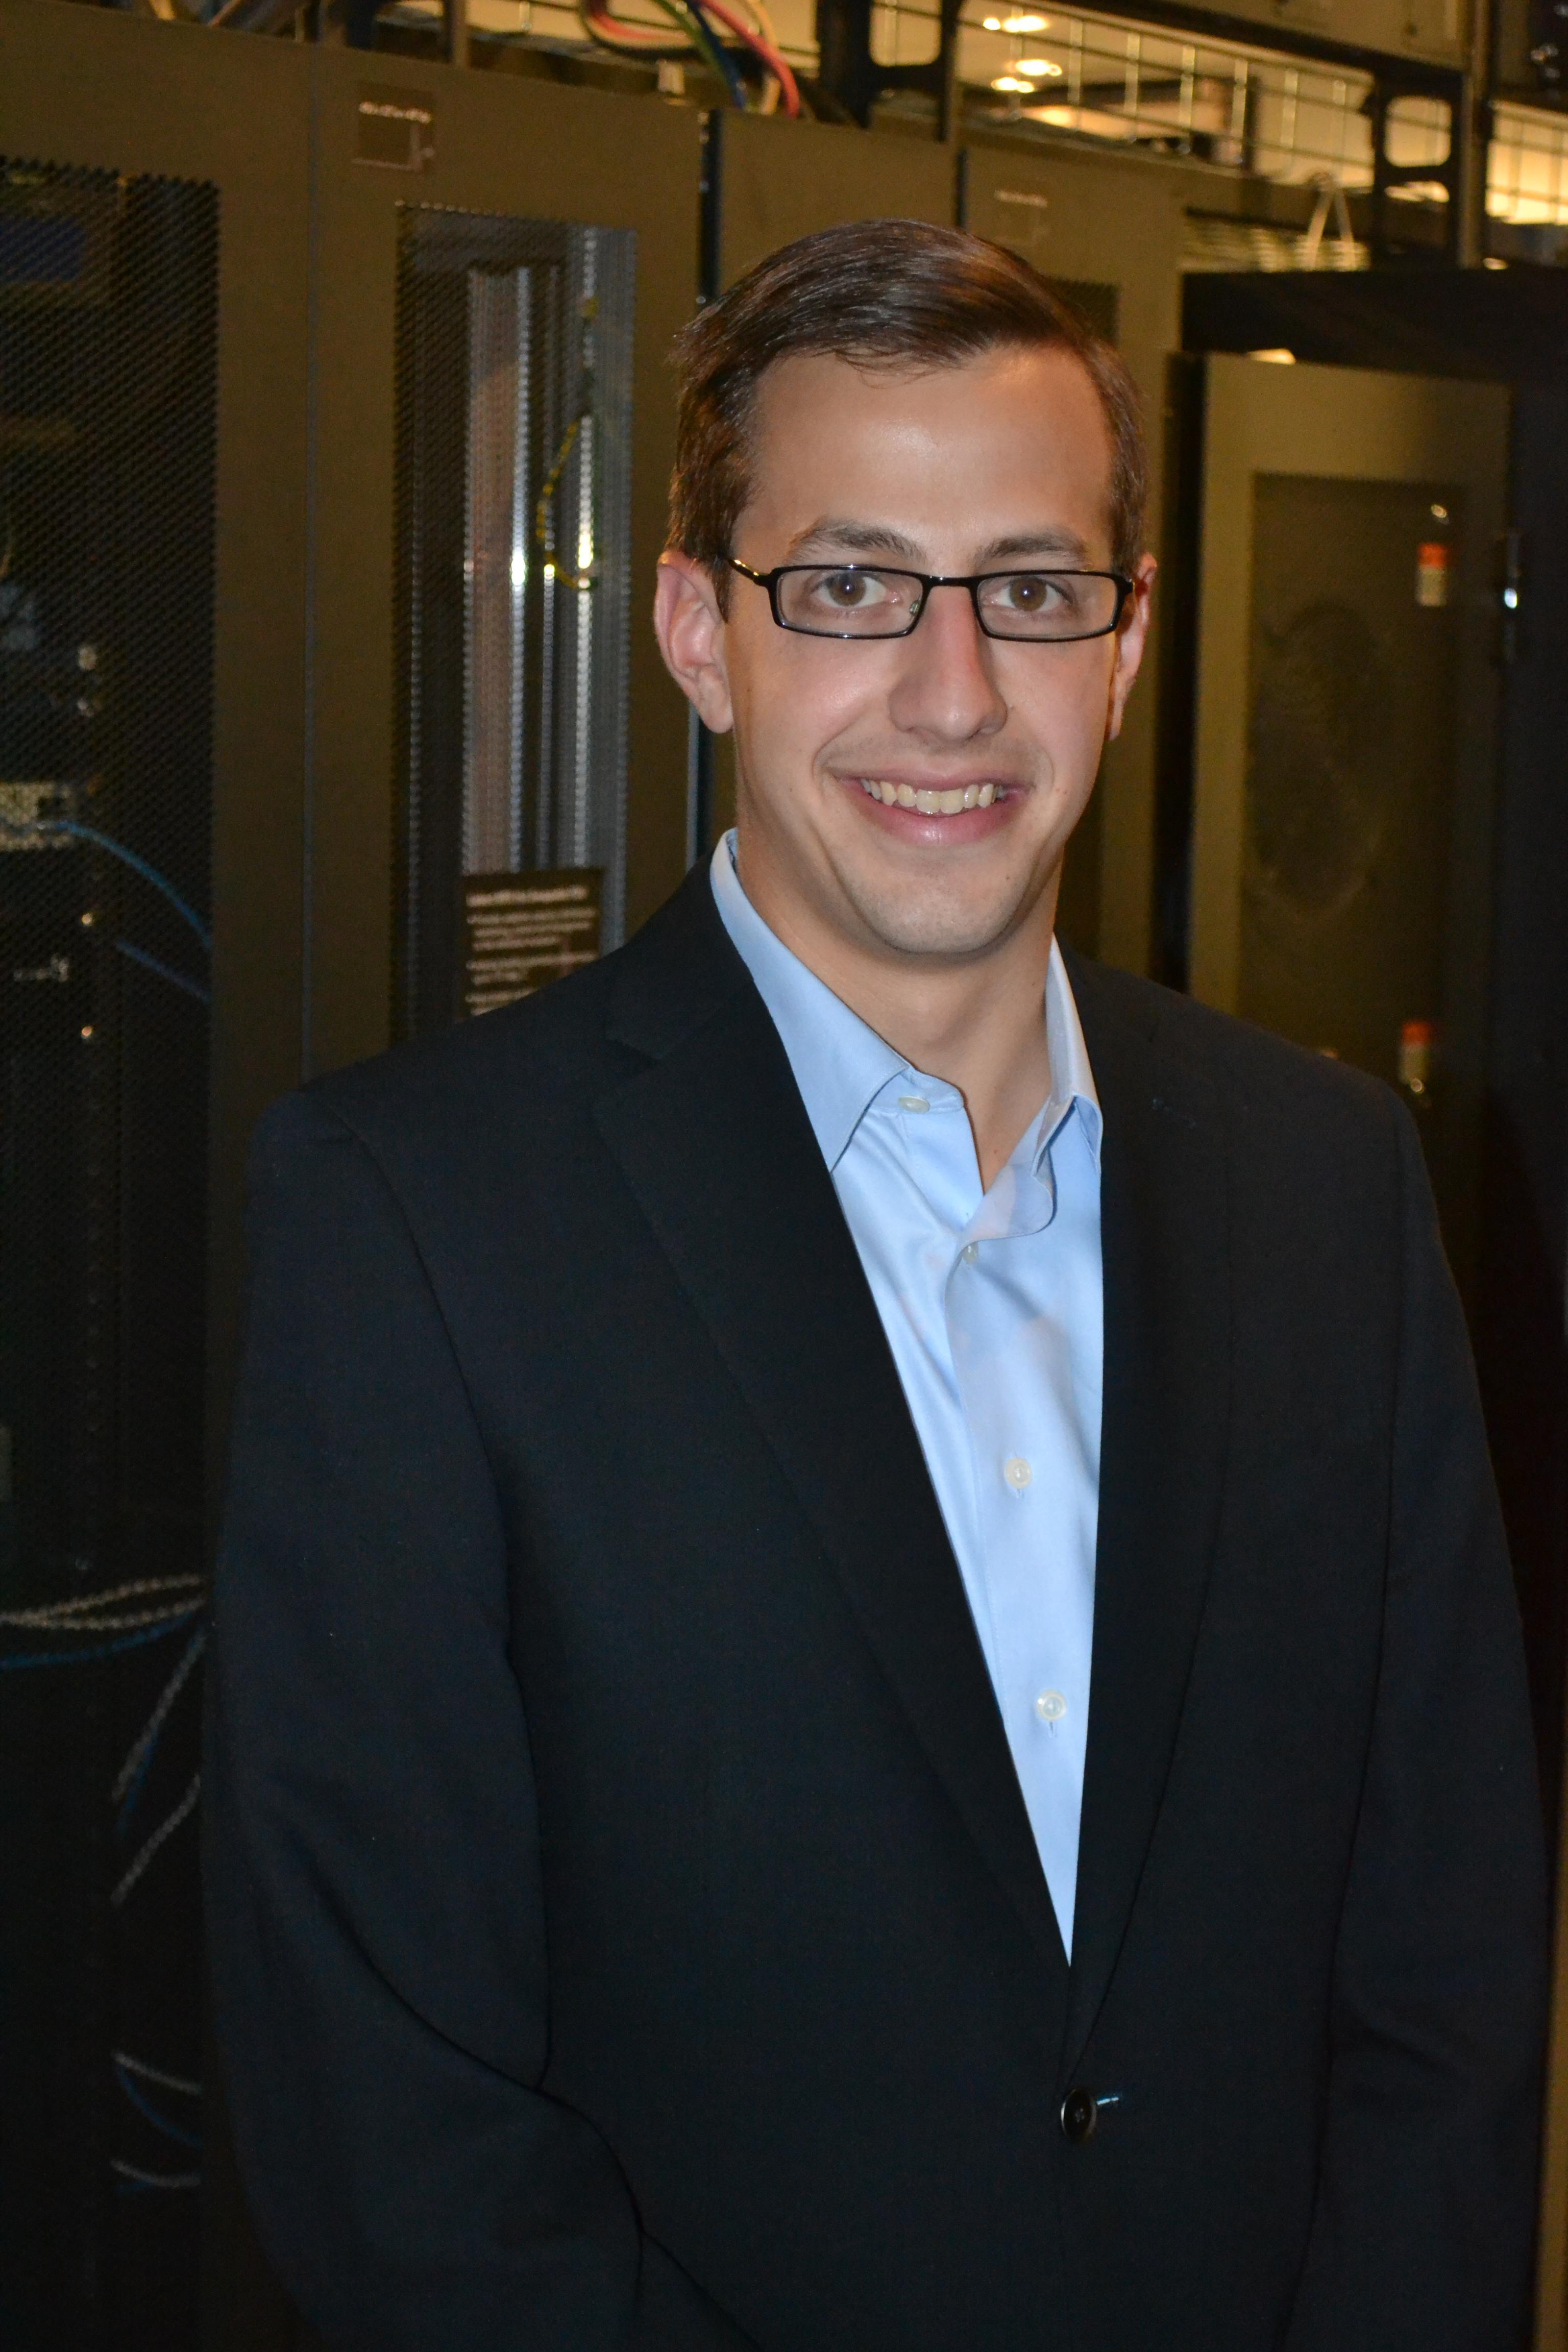 Matthew Morabito